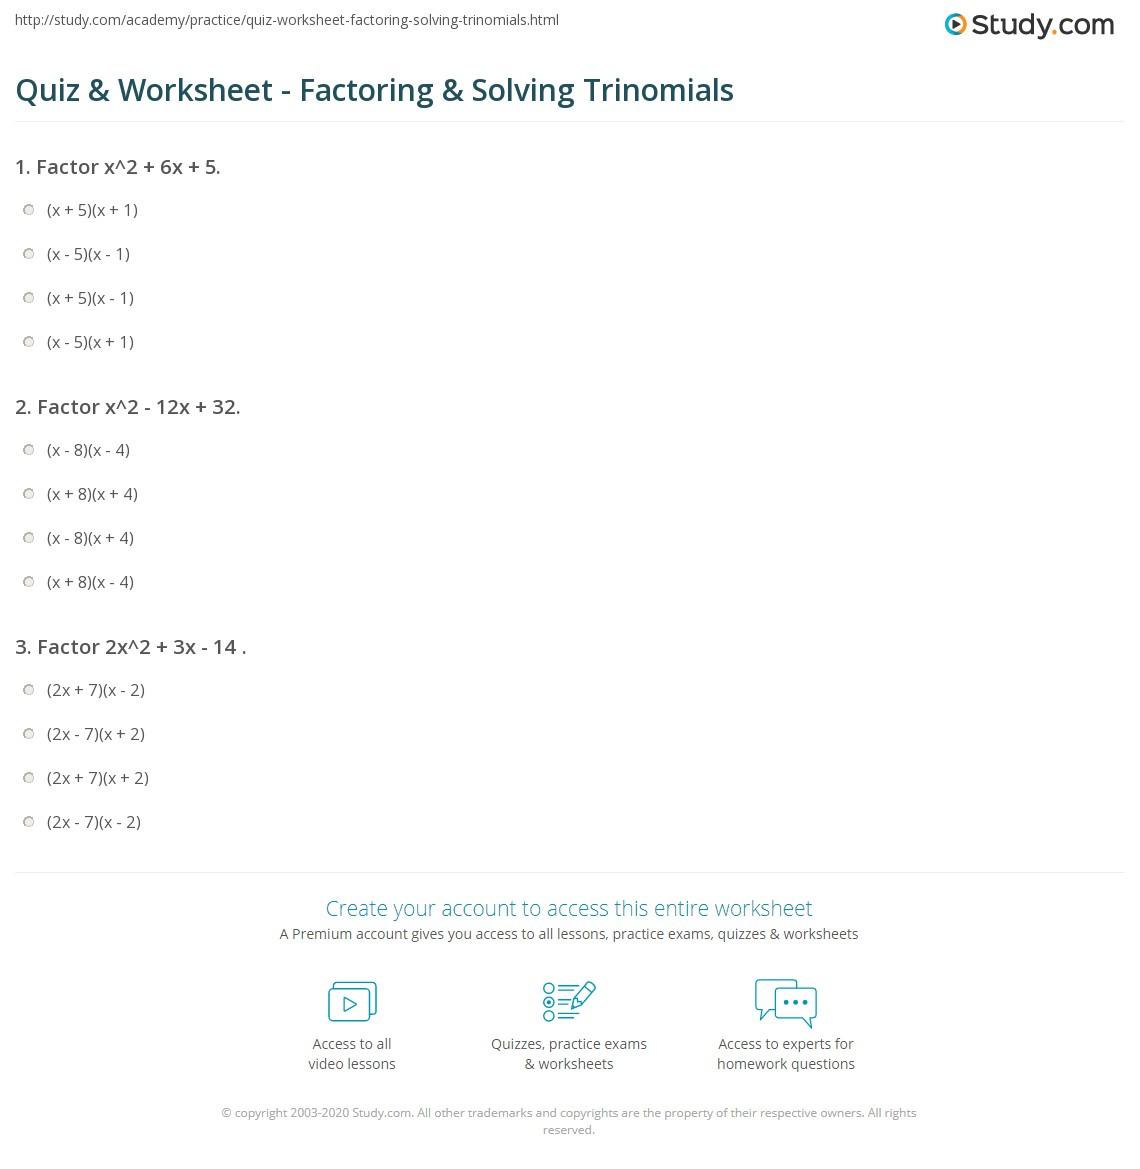 30 Factoring Trinomials A 1 Worksheet